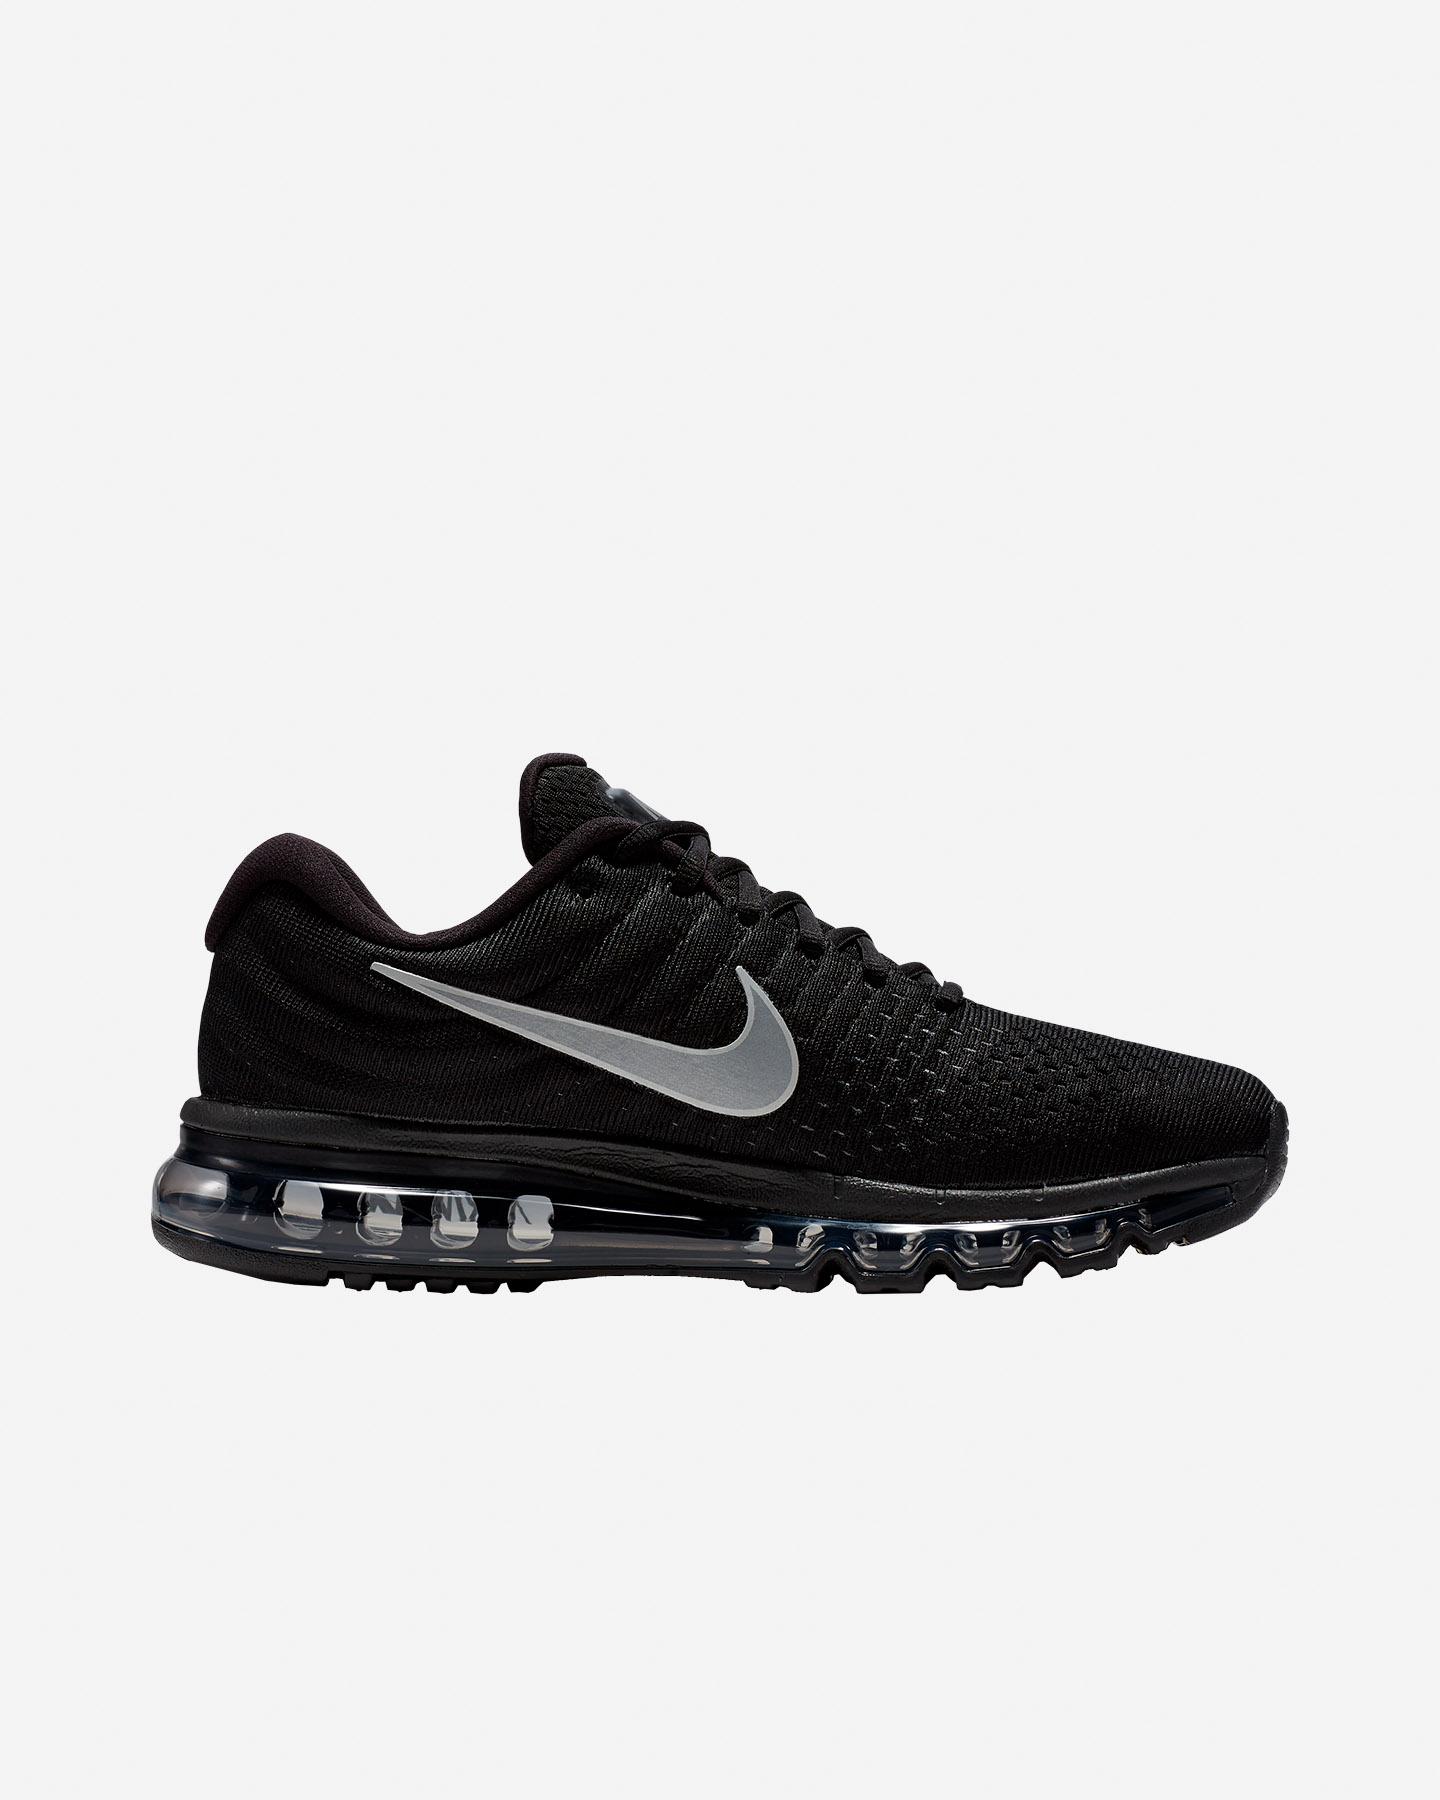 Scarpe Running Nike Ultimo Modello Uomo Air Max 2017